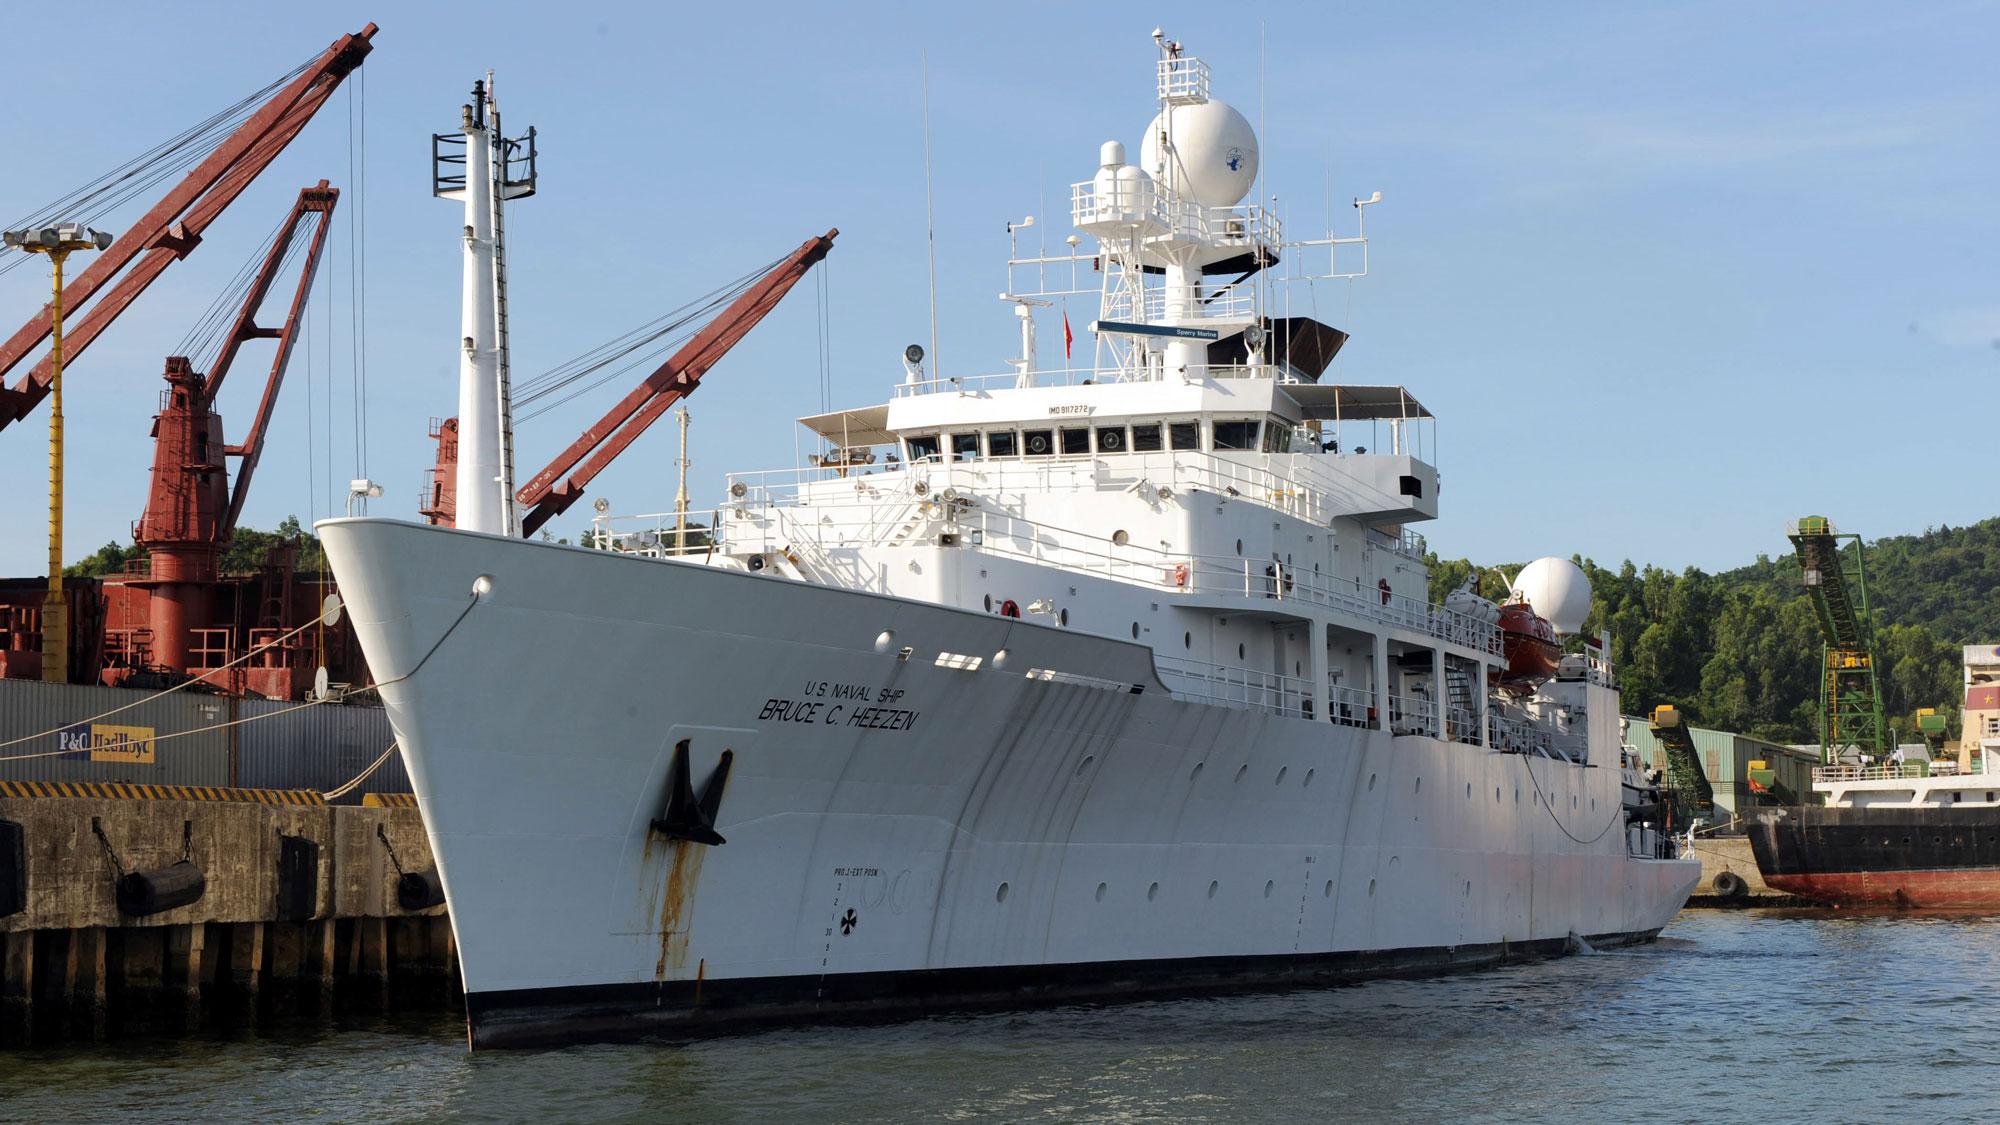 File photo of US Navy oceanographic survey ship USNS Bruce C. Heezen anchored at Da Nang, Vietnam.